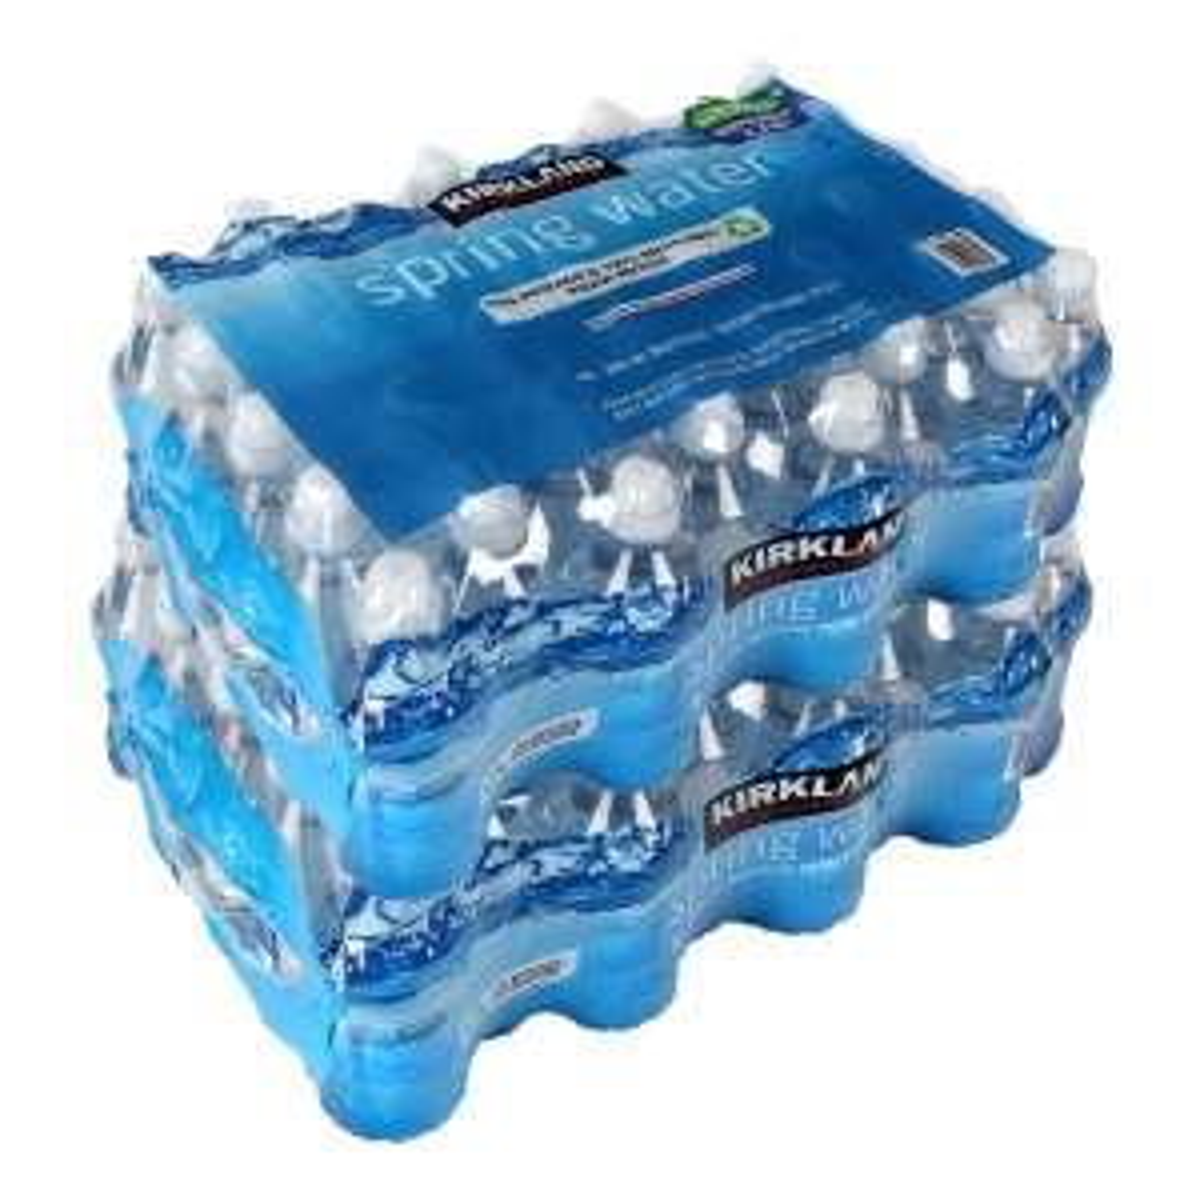 80 x 330ml Sports Cap Bottles £12.99 @ Costco